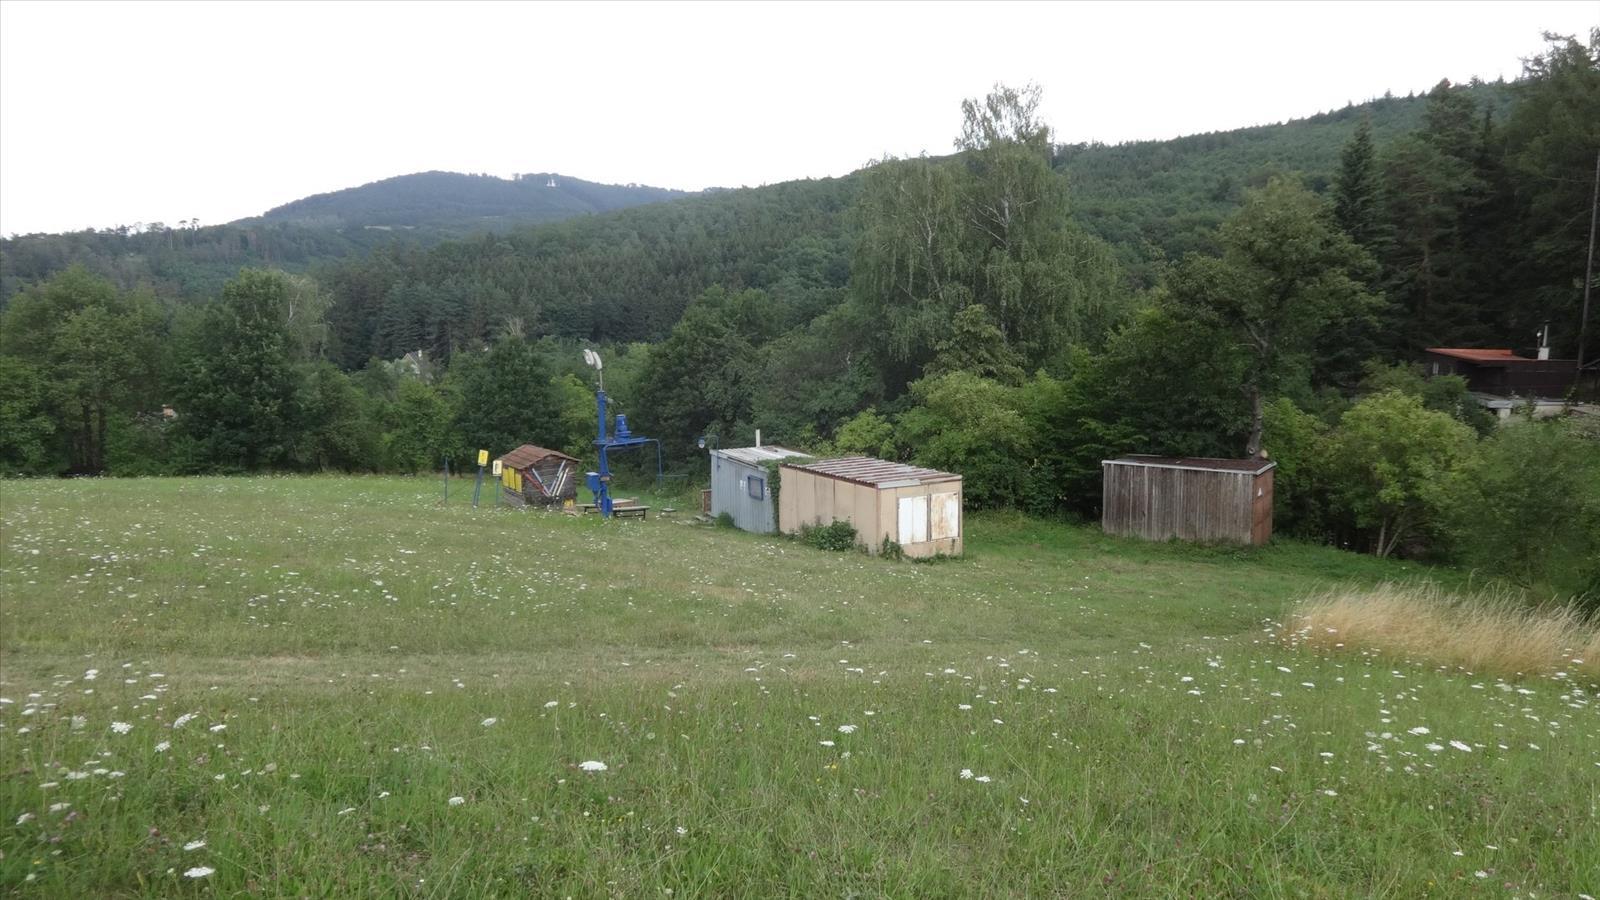 636843714853620089_prodej-zahrady-431-m2-korycany-zdrava-voda-okr-kromeriz-dsc08104-fc05c3.jpg